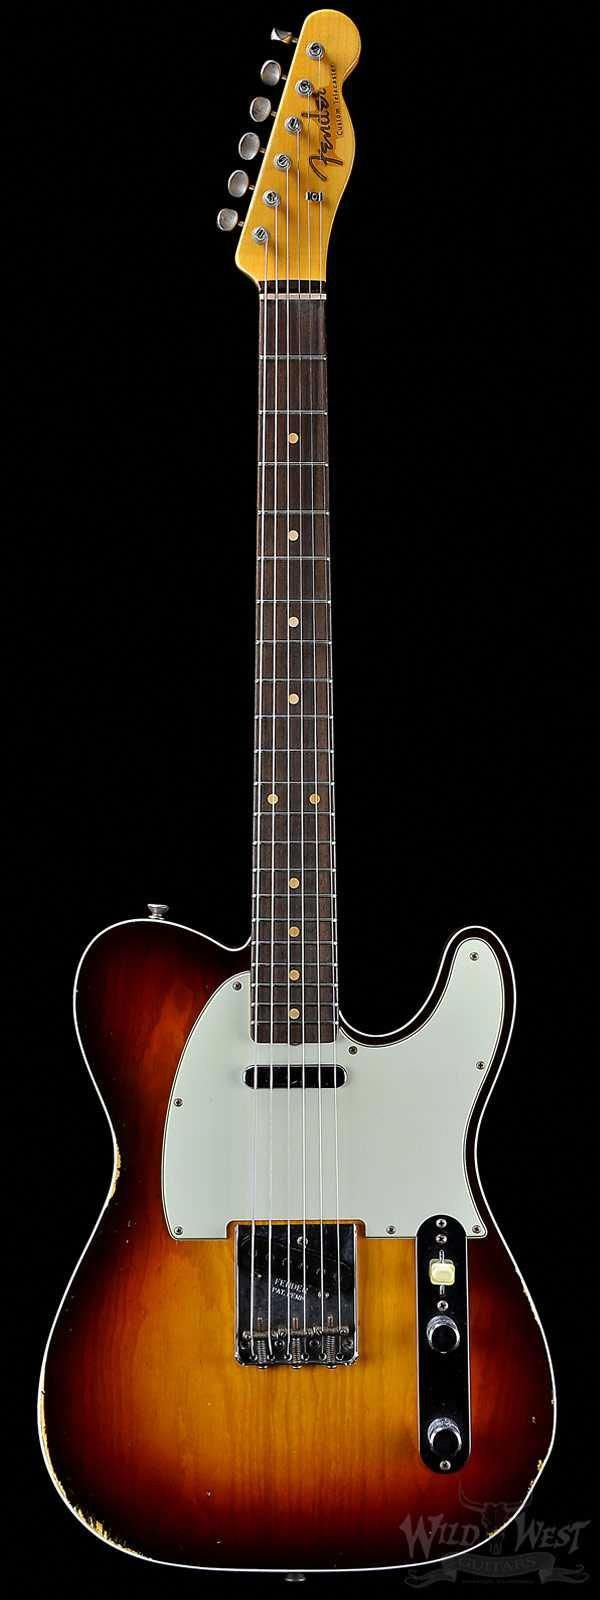 Psychedelic Tie Dye Snakeskin Monogram Guitar Case Zazzle Com Guitar Case Guitar Monogram